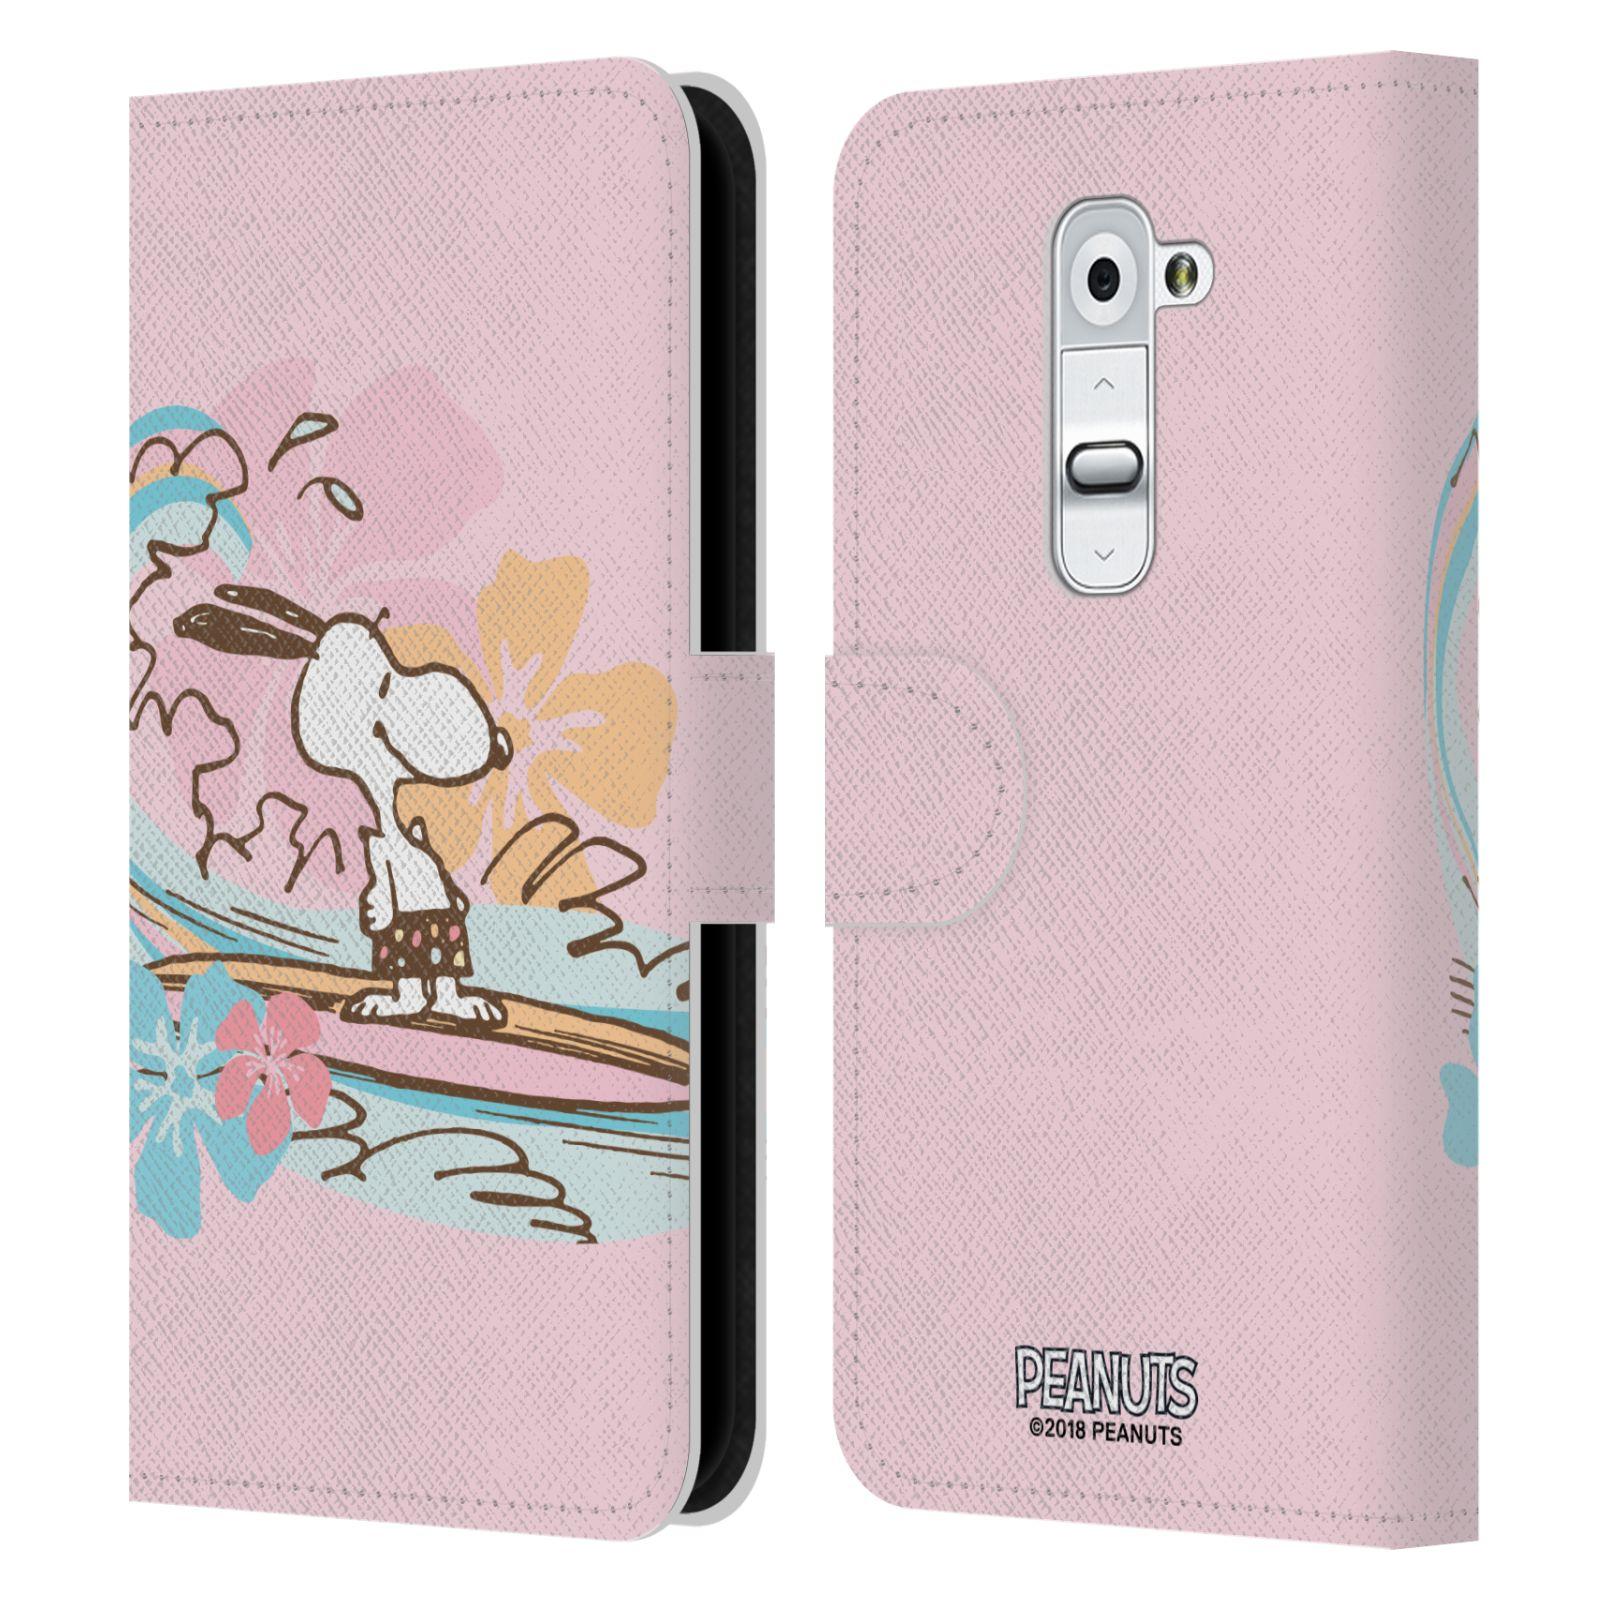 Pouzdro na mobil LG G2 - Head Case - Peanuts - Snoopy pejsek surfuje